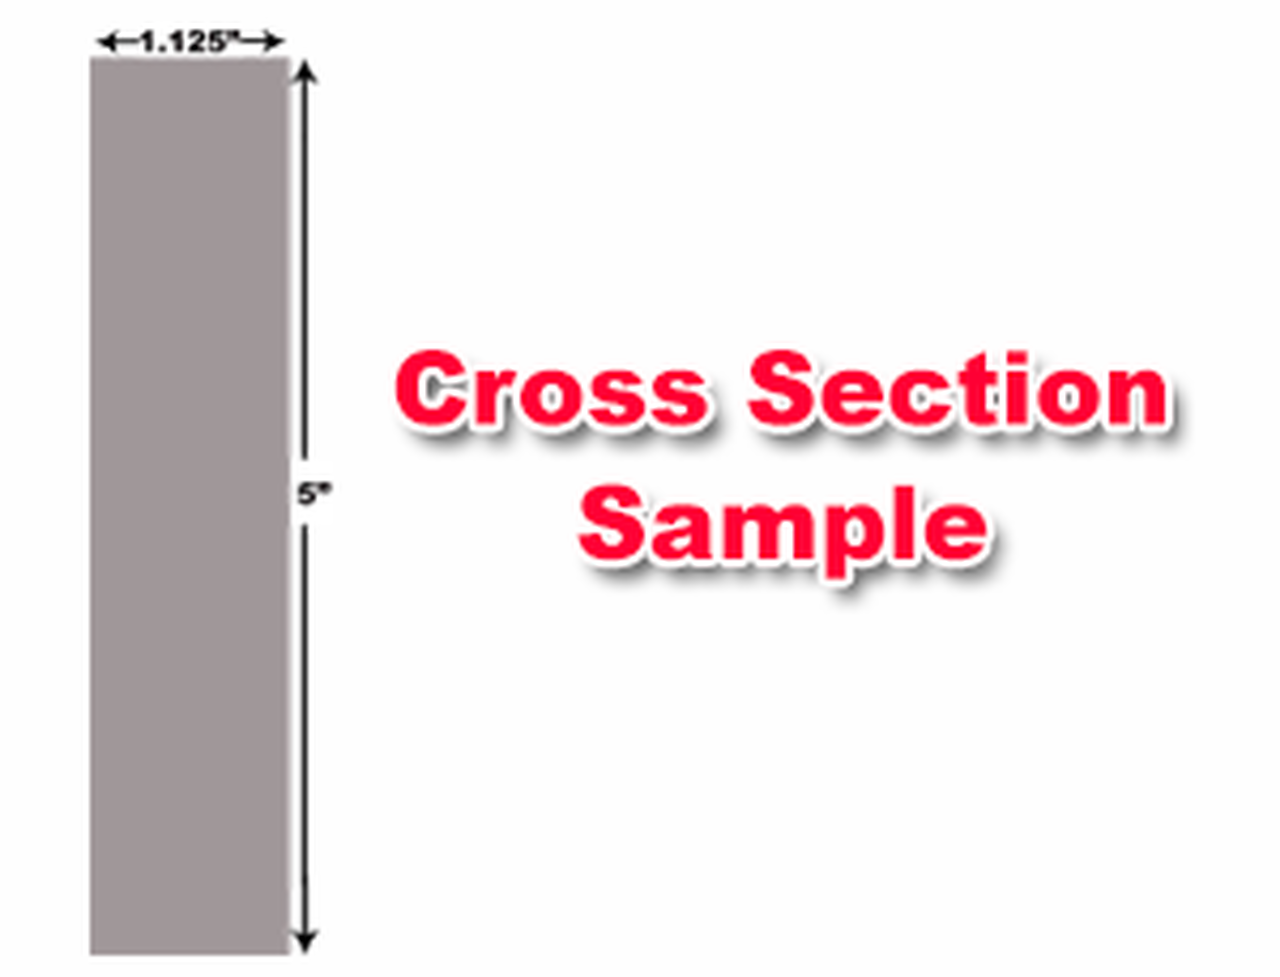 "Cincinnati Shear Knives - 124"" Length, 5"" x 1.125"" Cross Section (239243) Type C"